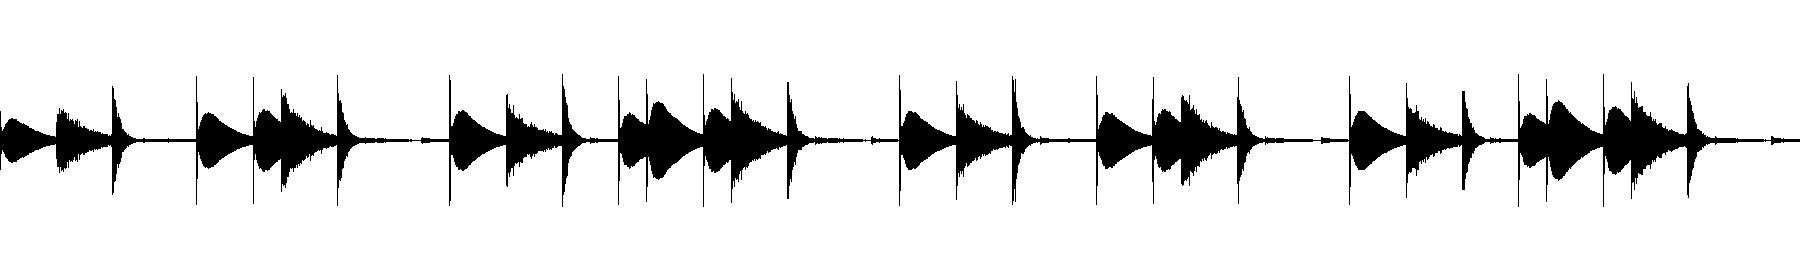 ambient drums 60 bpm 01